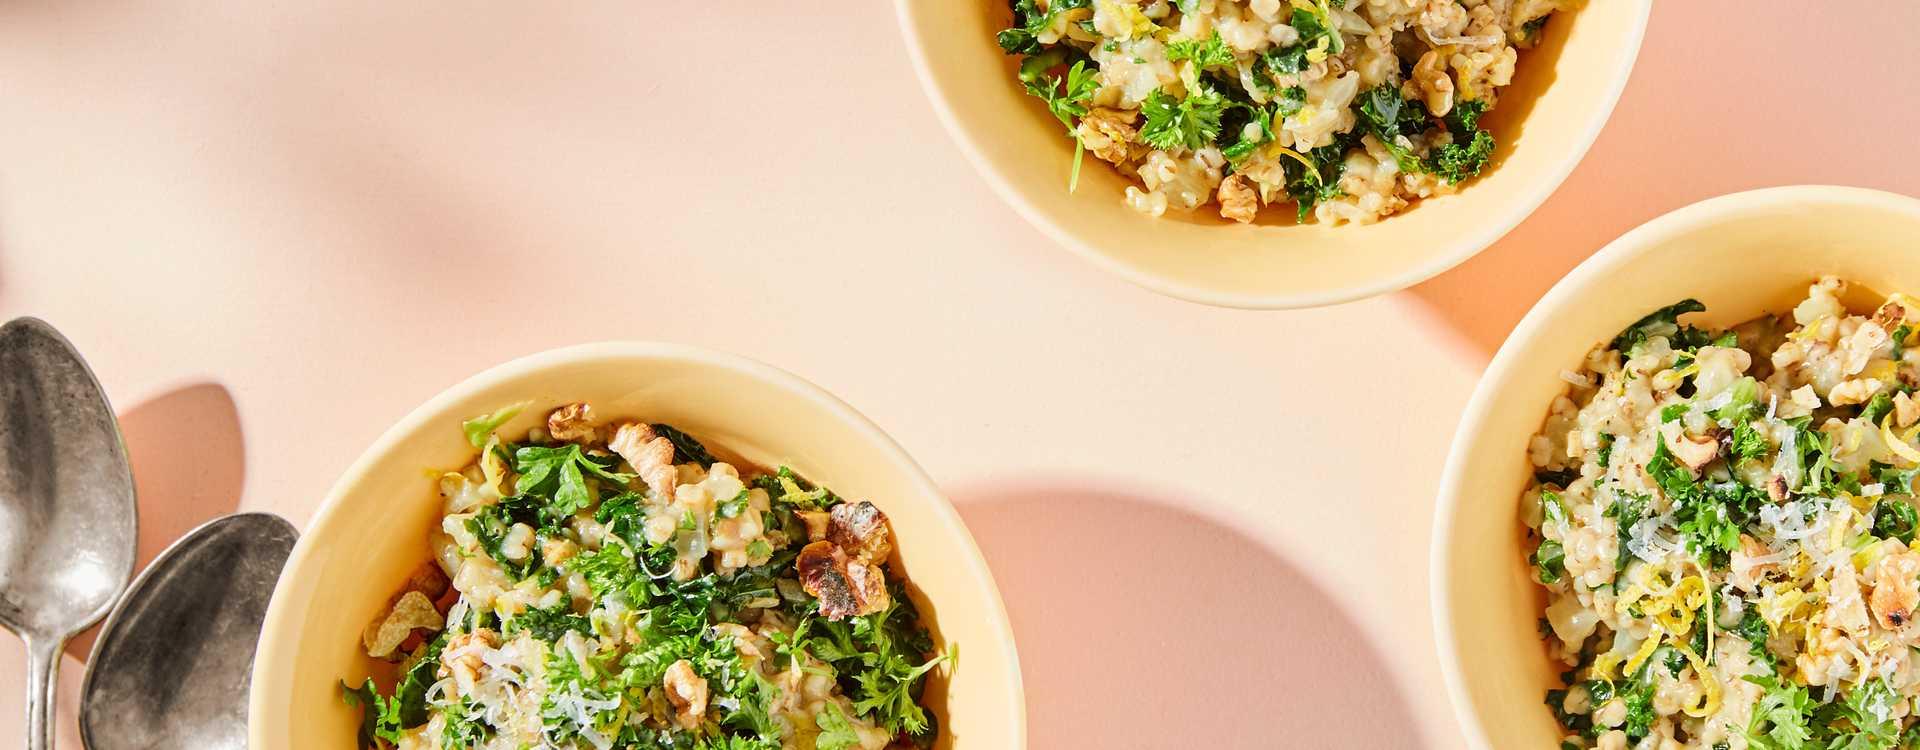 Grønn byggotto med grønnkål